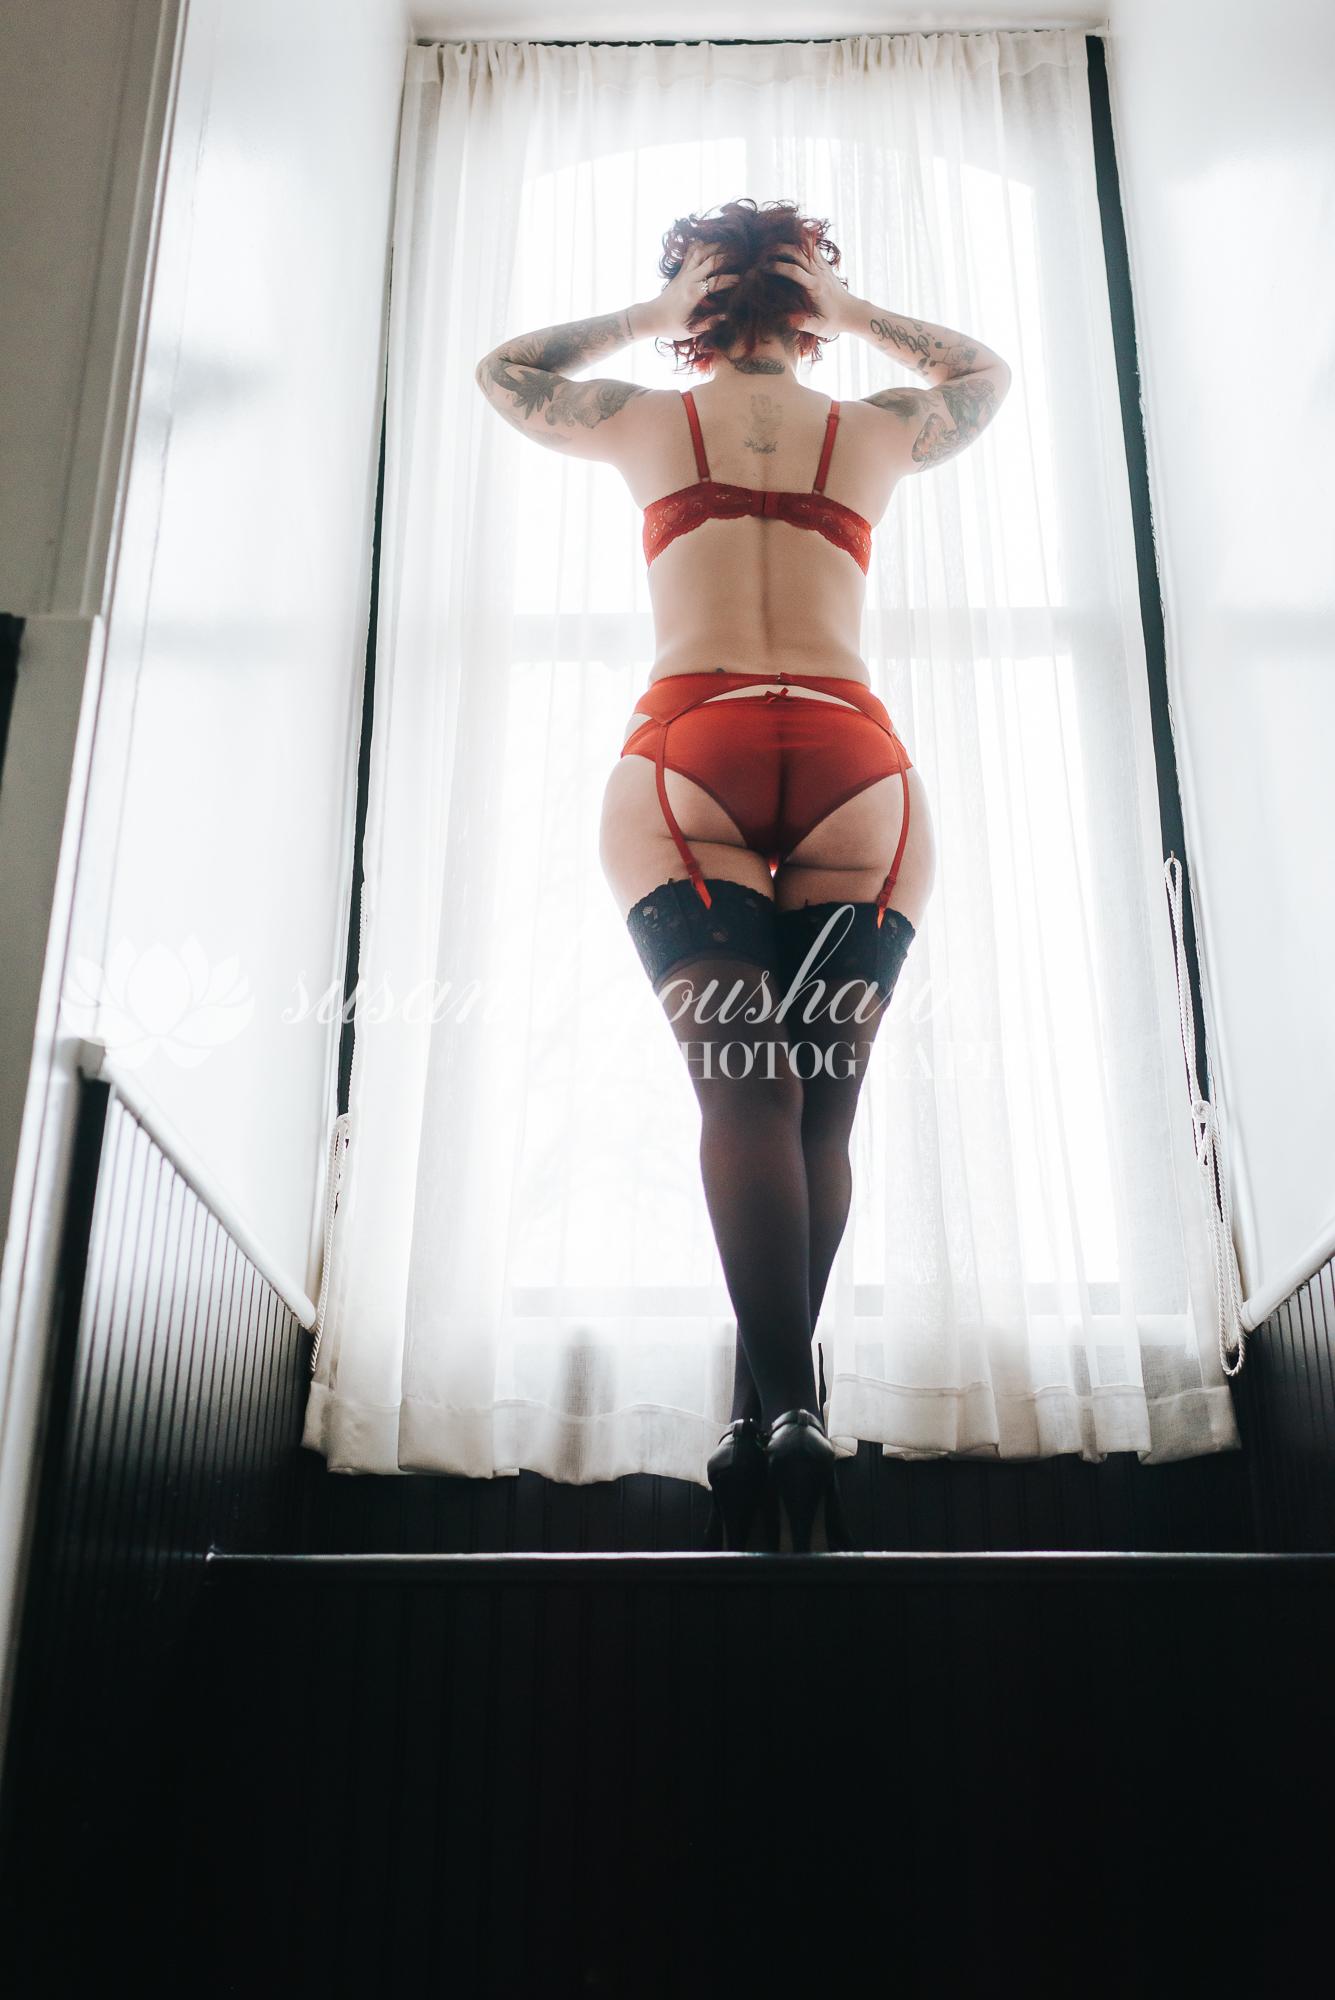 Vakentine Boudoir 01-12-2019 sly photography -1.jpg